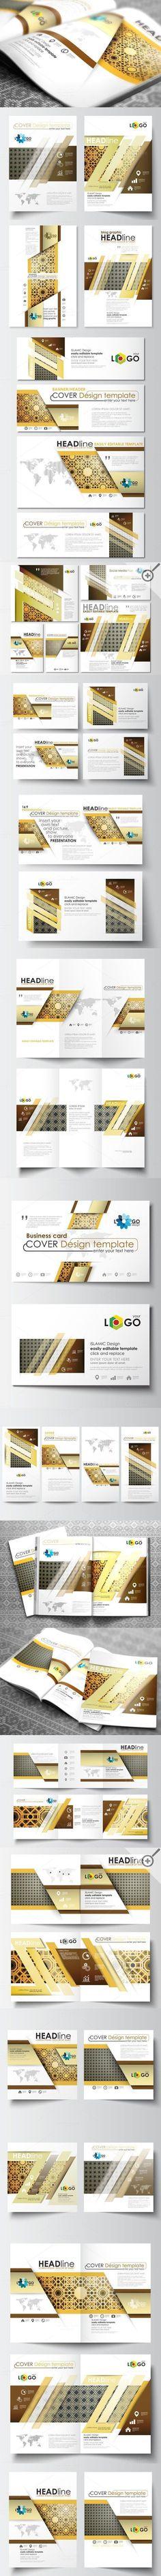 Business infographic : Business infographic : Business infographic : Flat design templates v.2. Busines